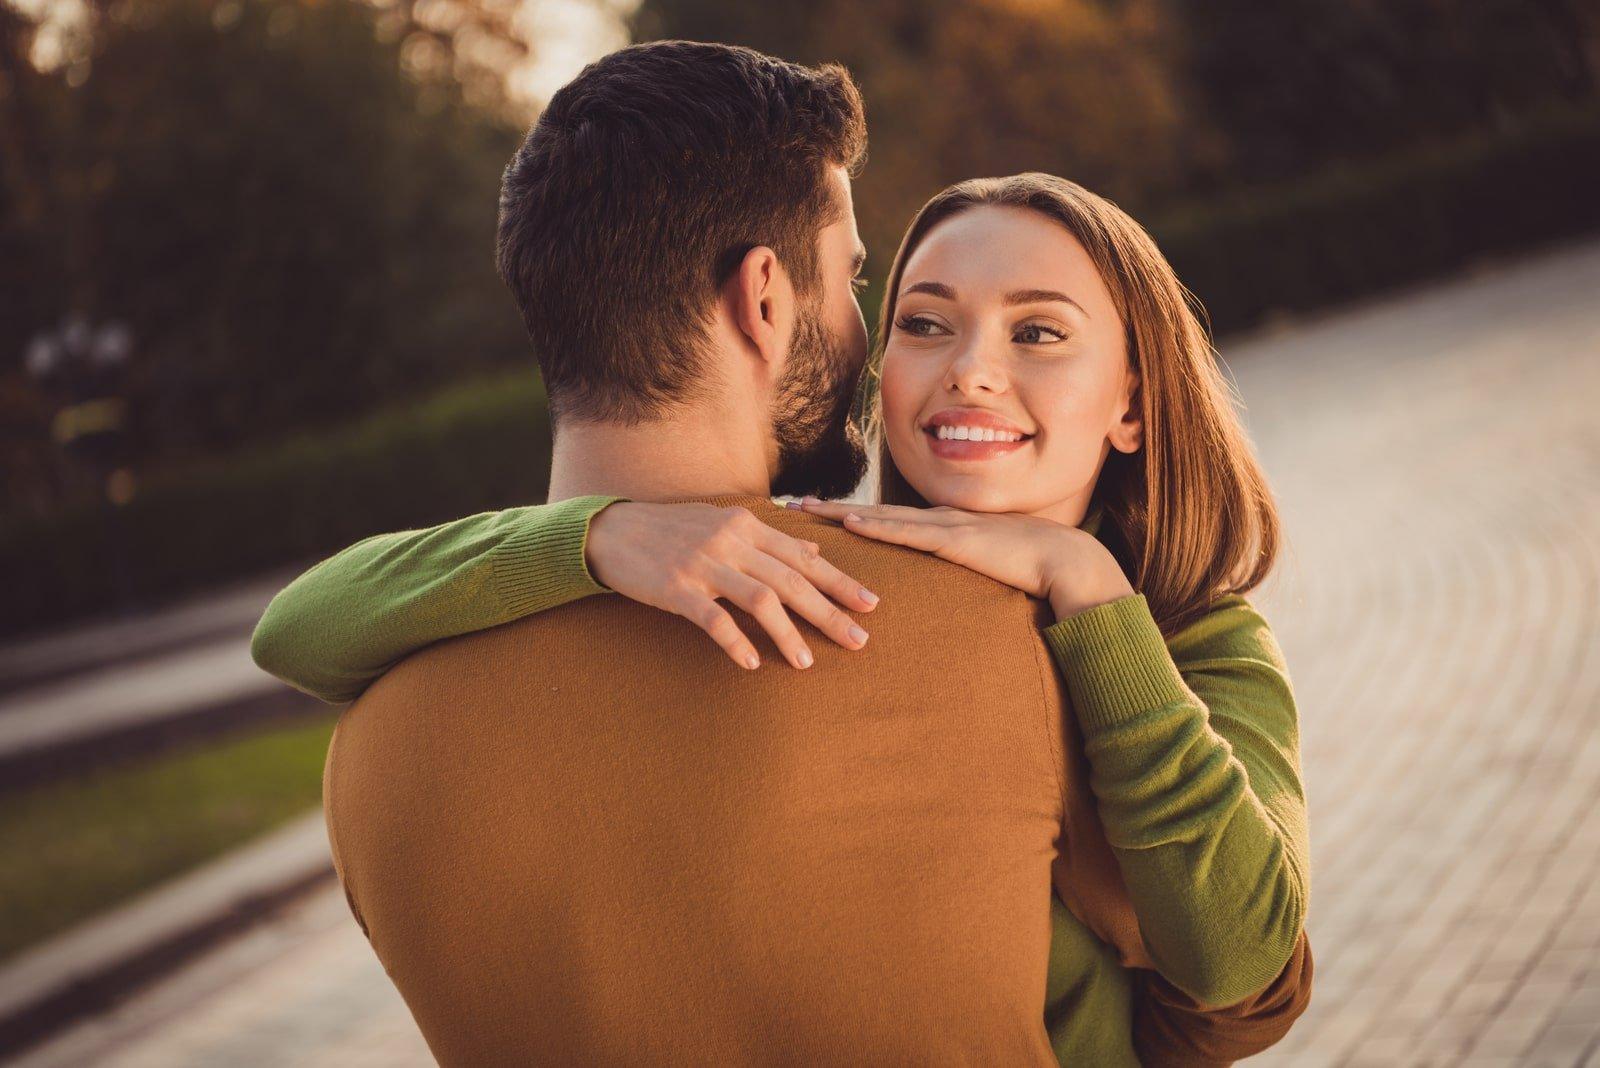 affectionate couple girl hug her boyfriend